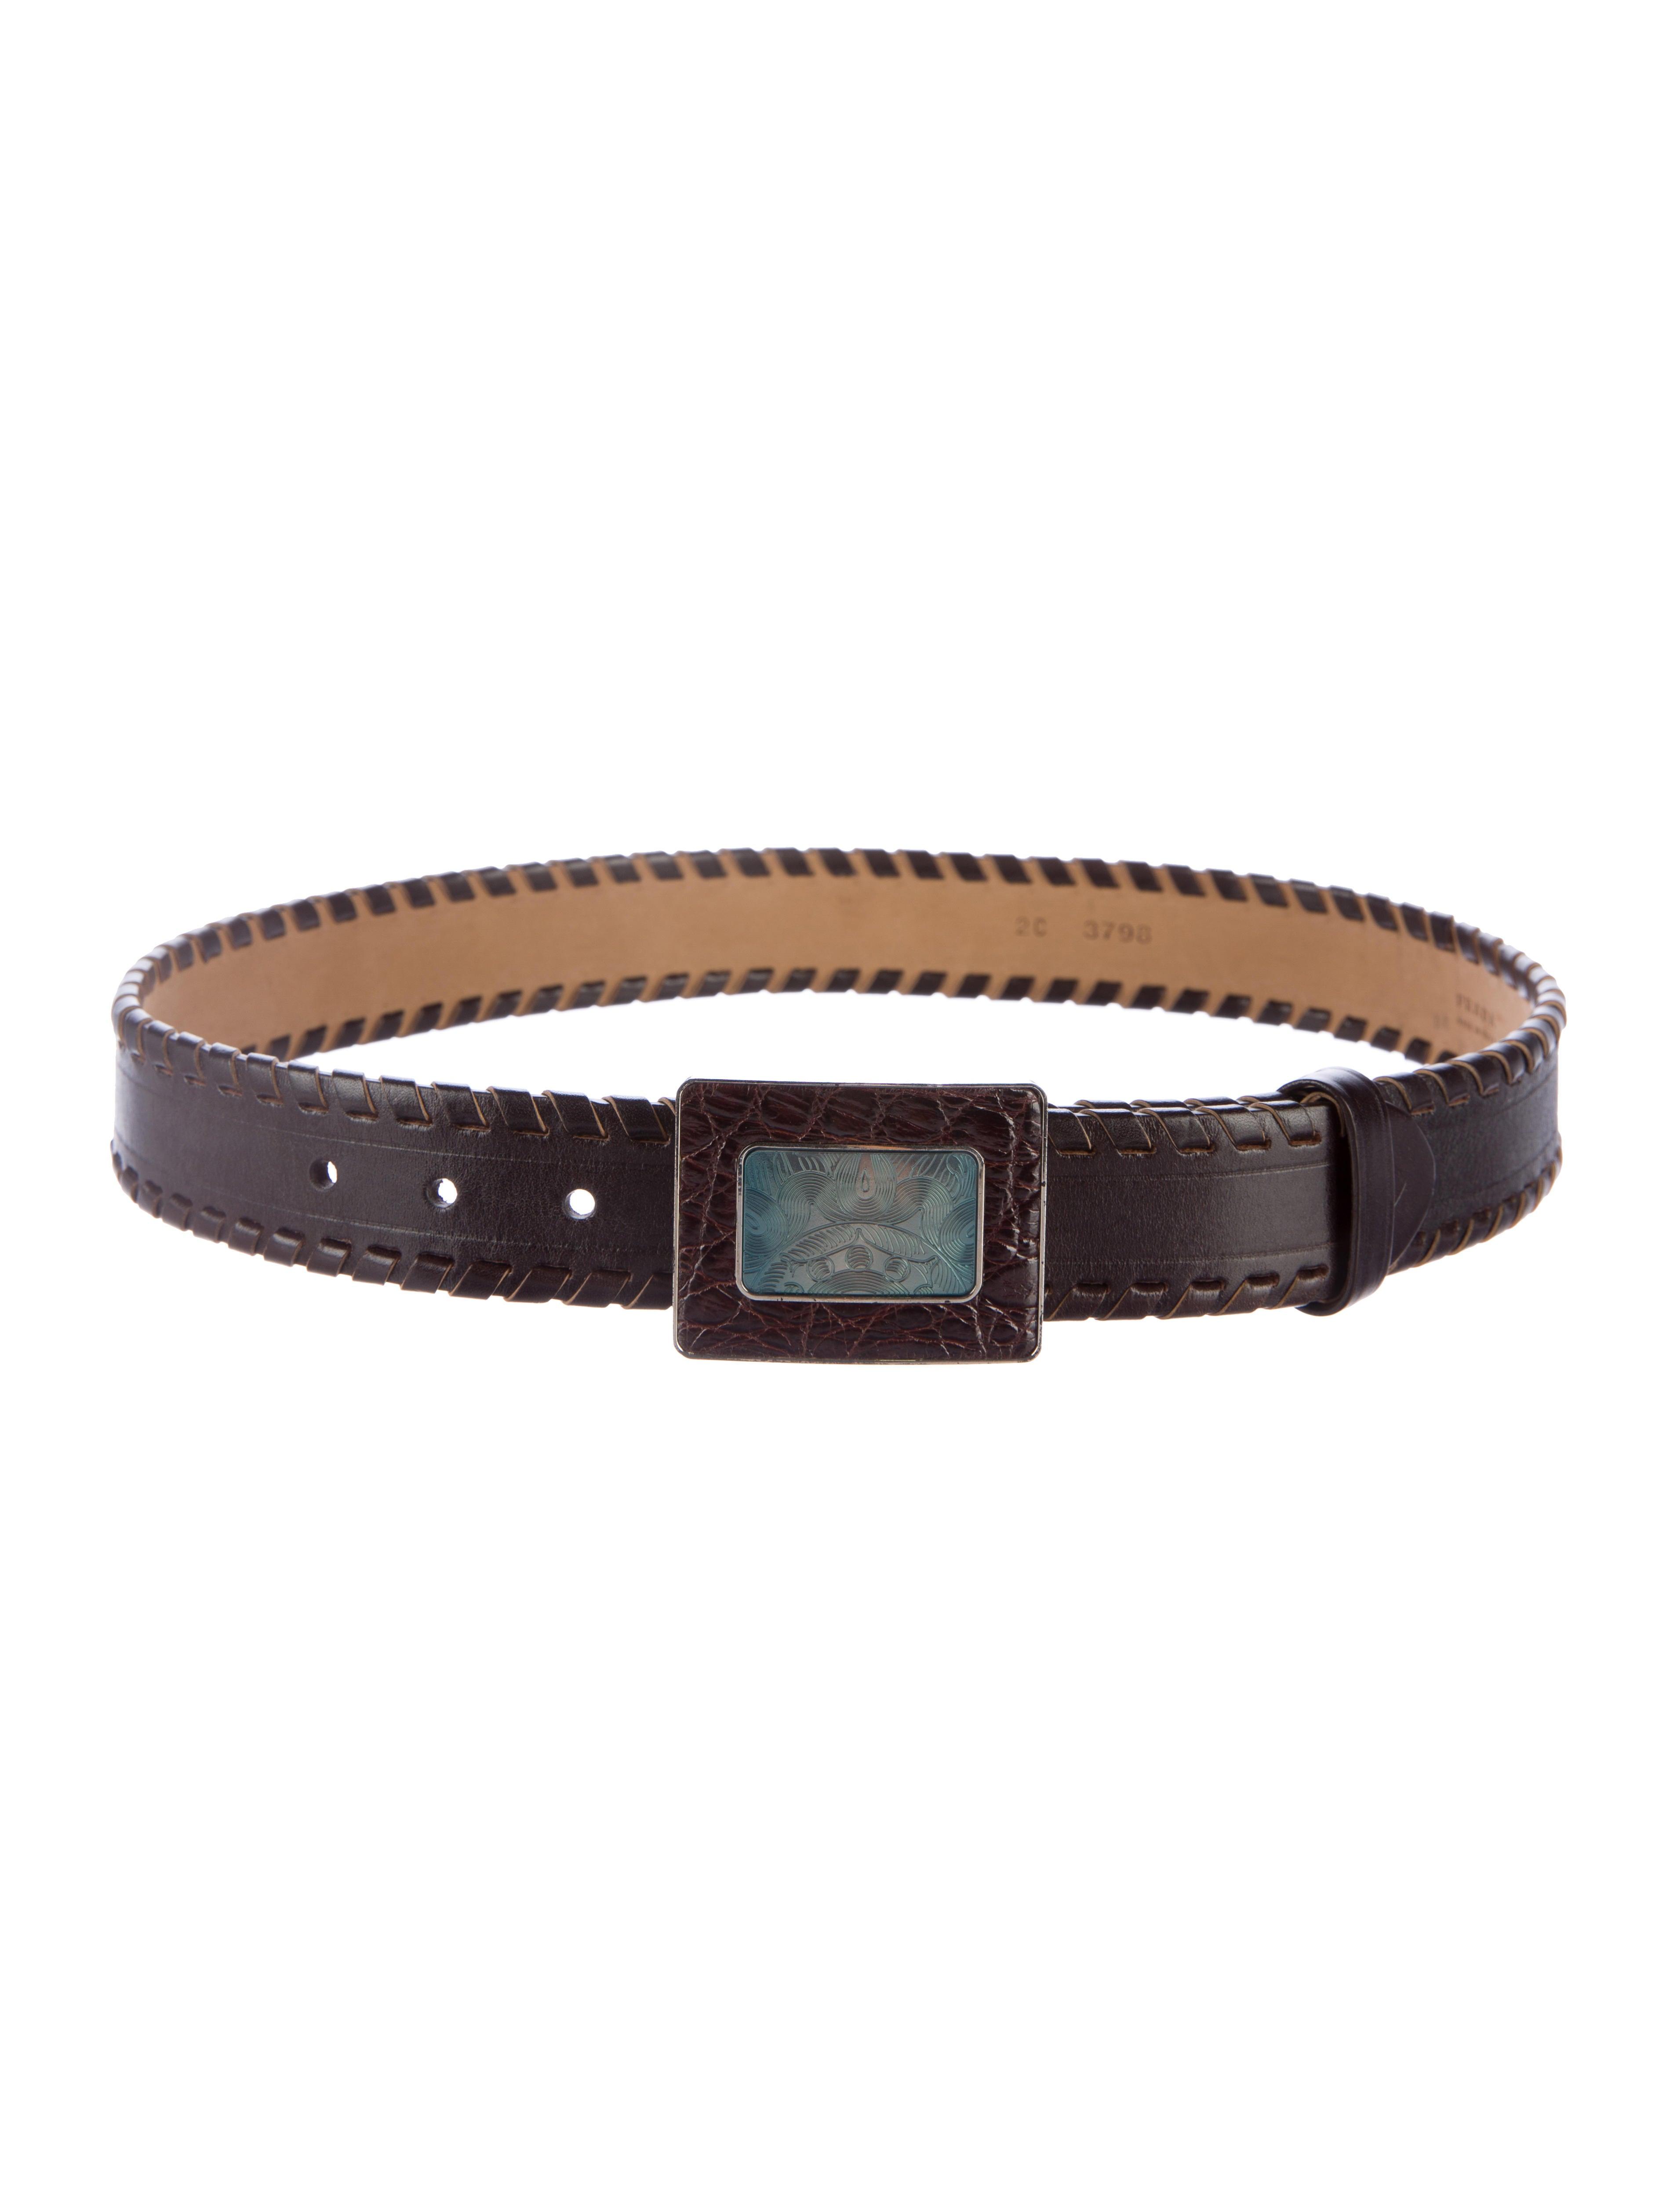 prada woven leather belt accessories pra144864 the